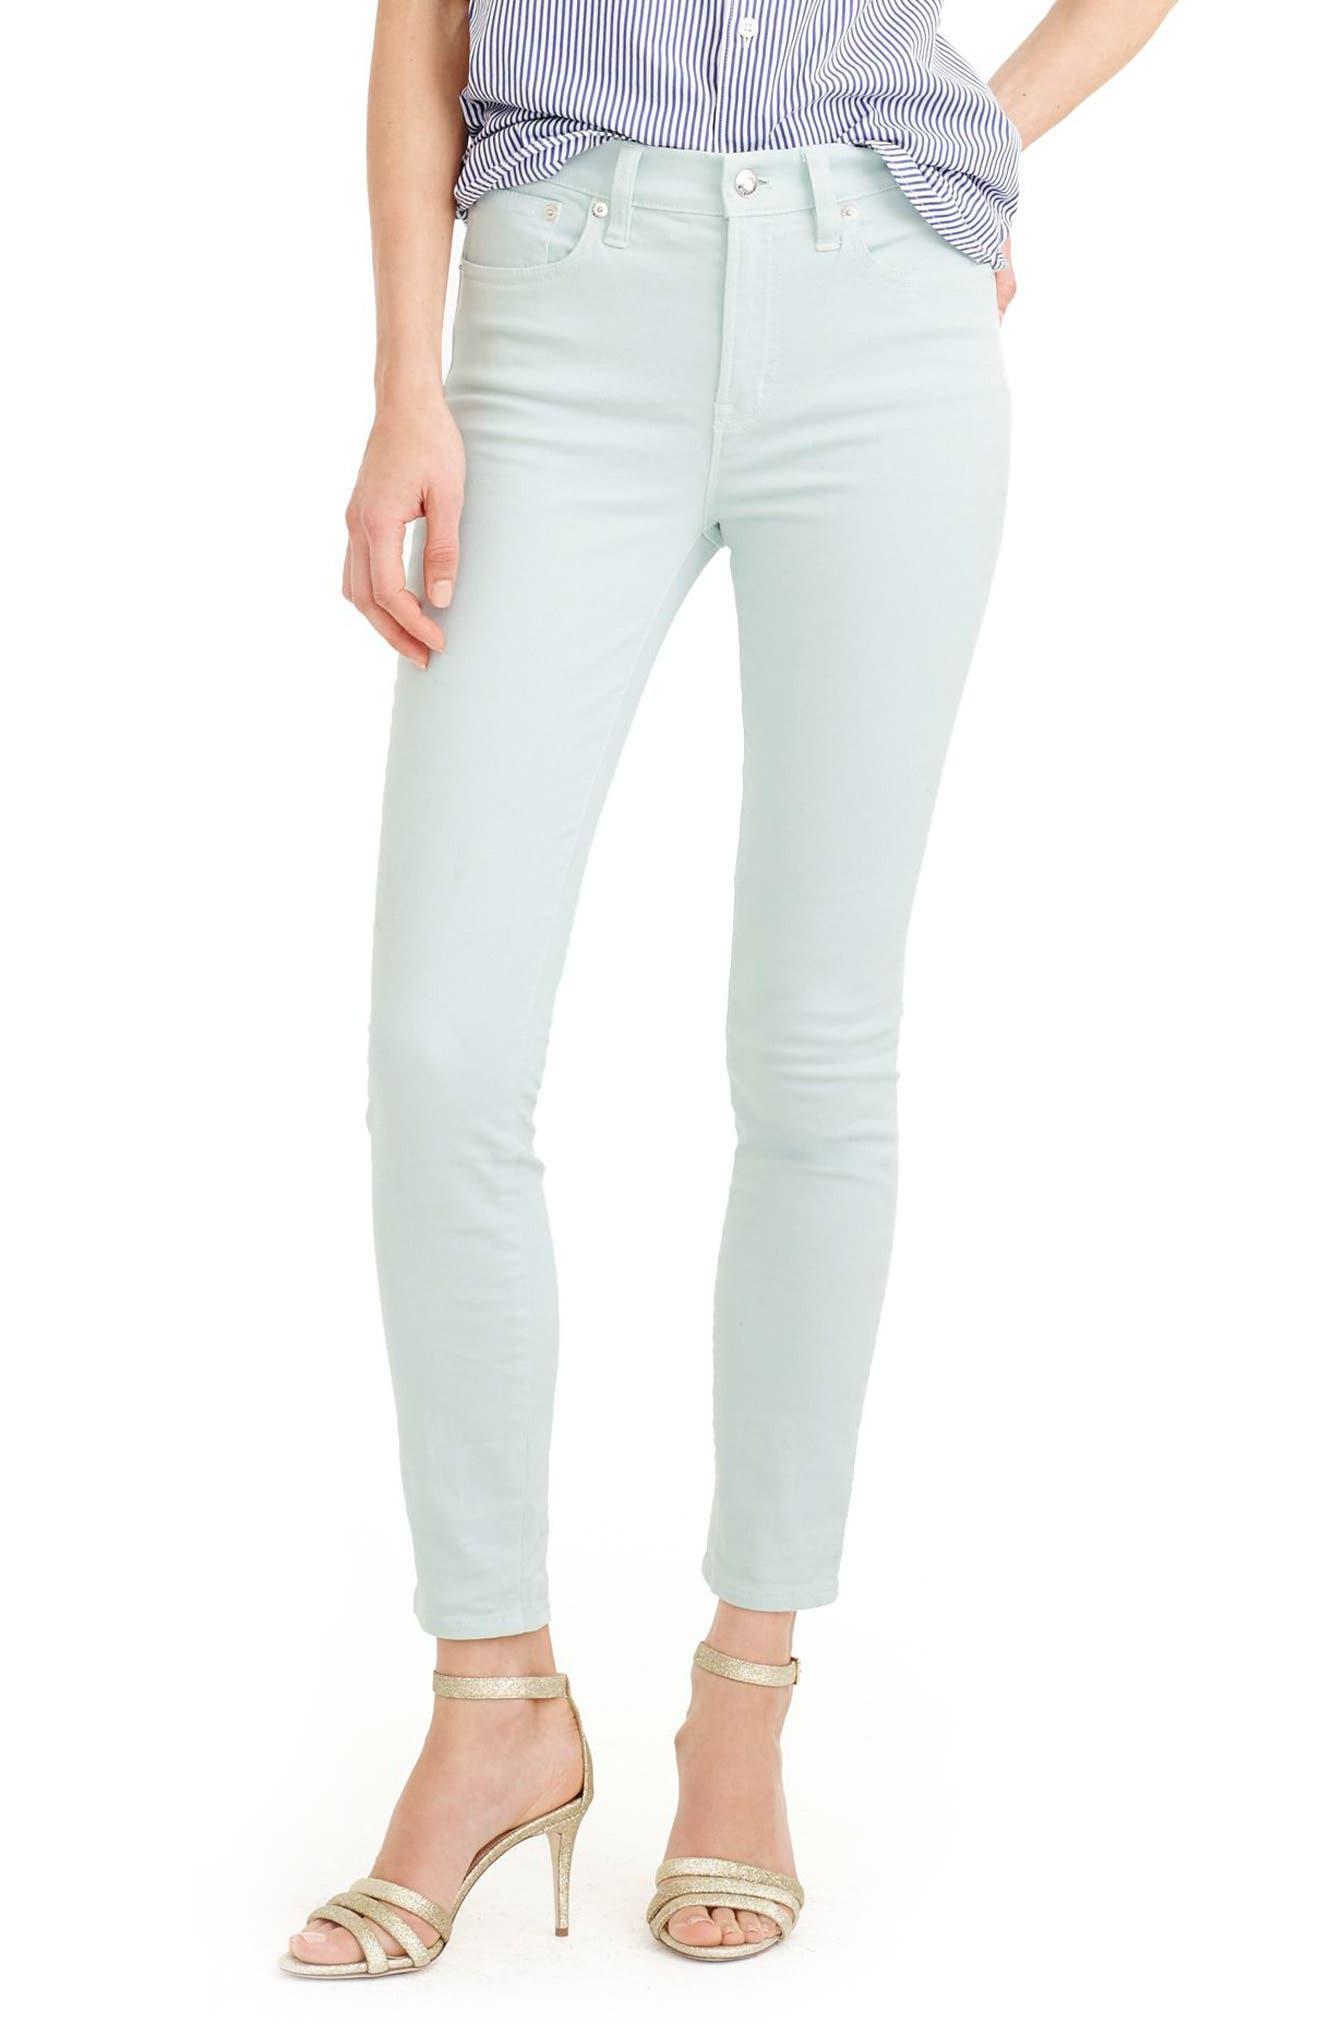 Main Image - J.Crew Lookout High Waist Garment Dyed Crop Jeans